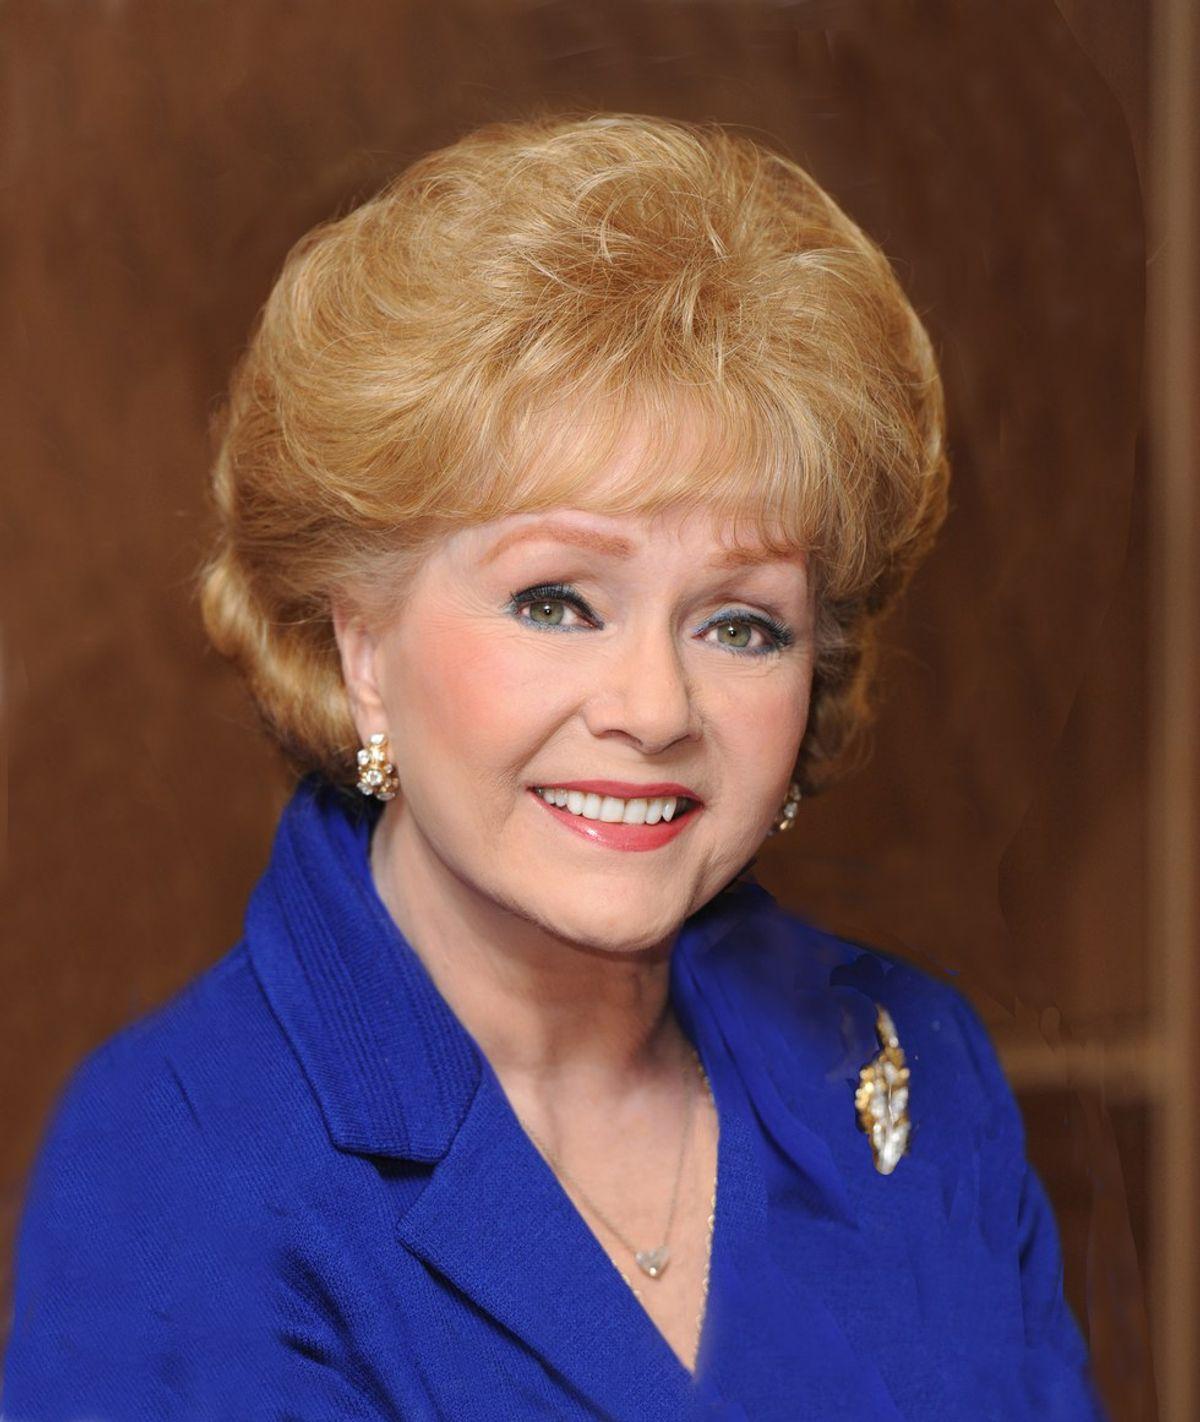 RIP, Debbie Reynolds